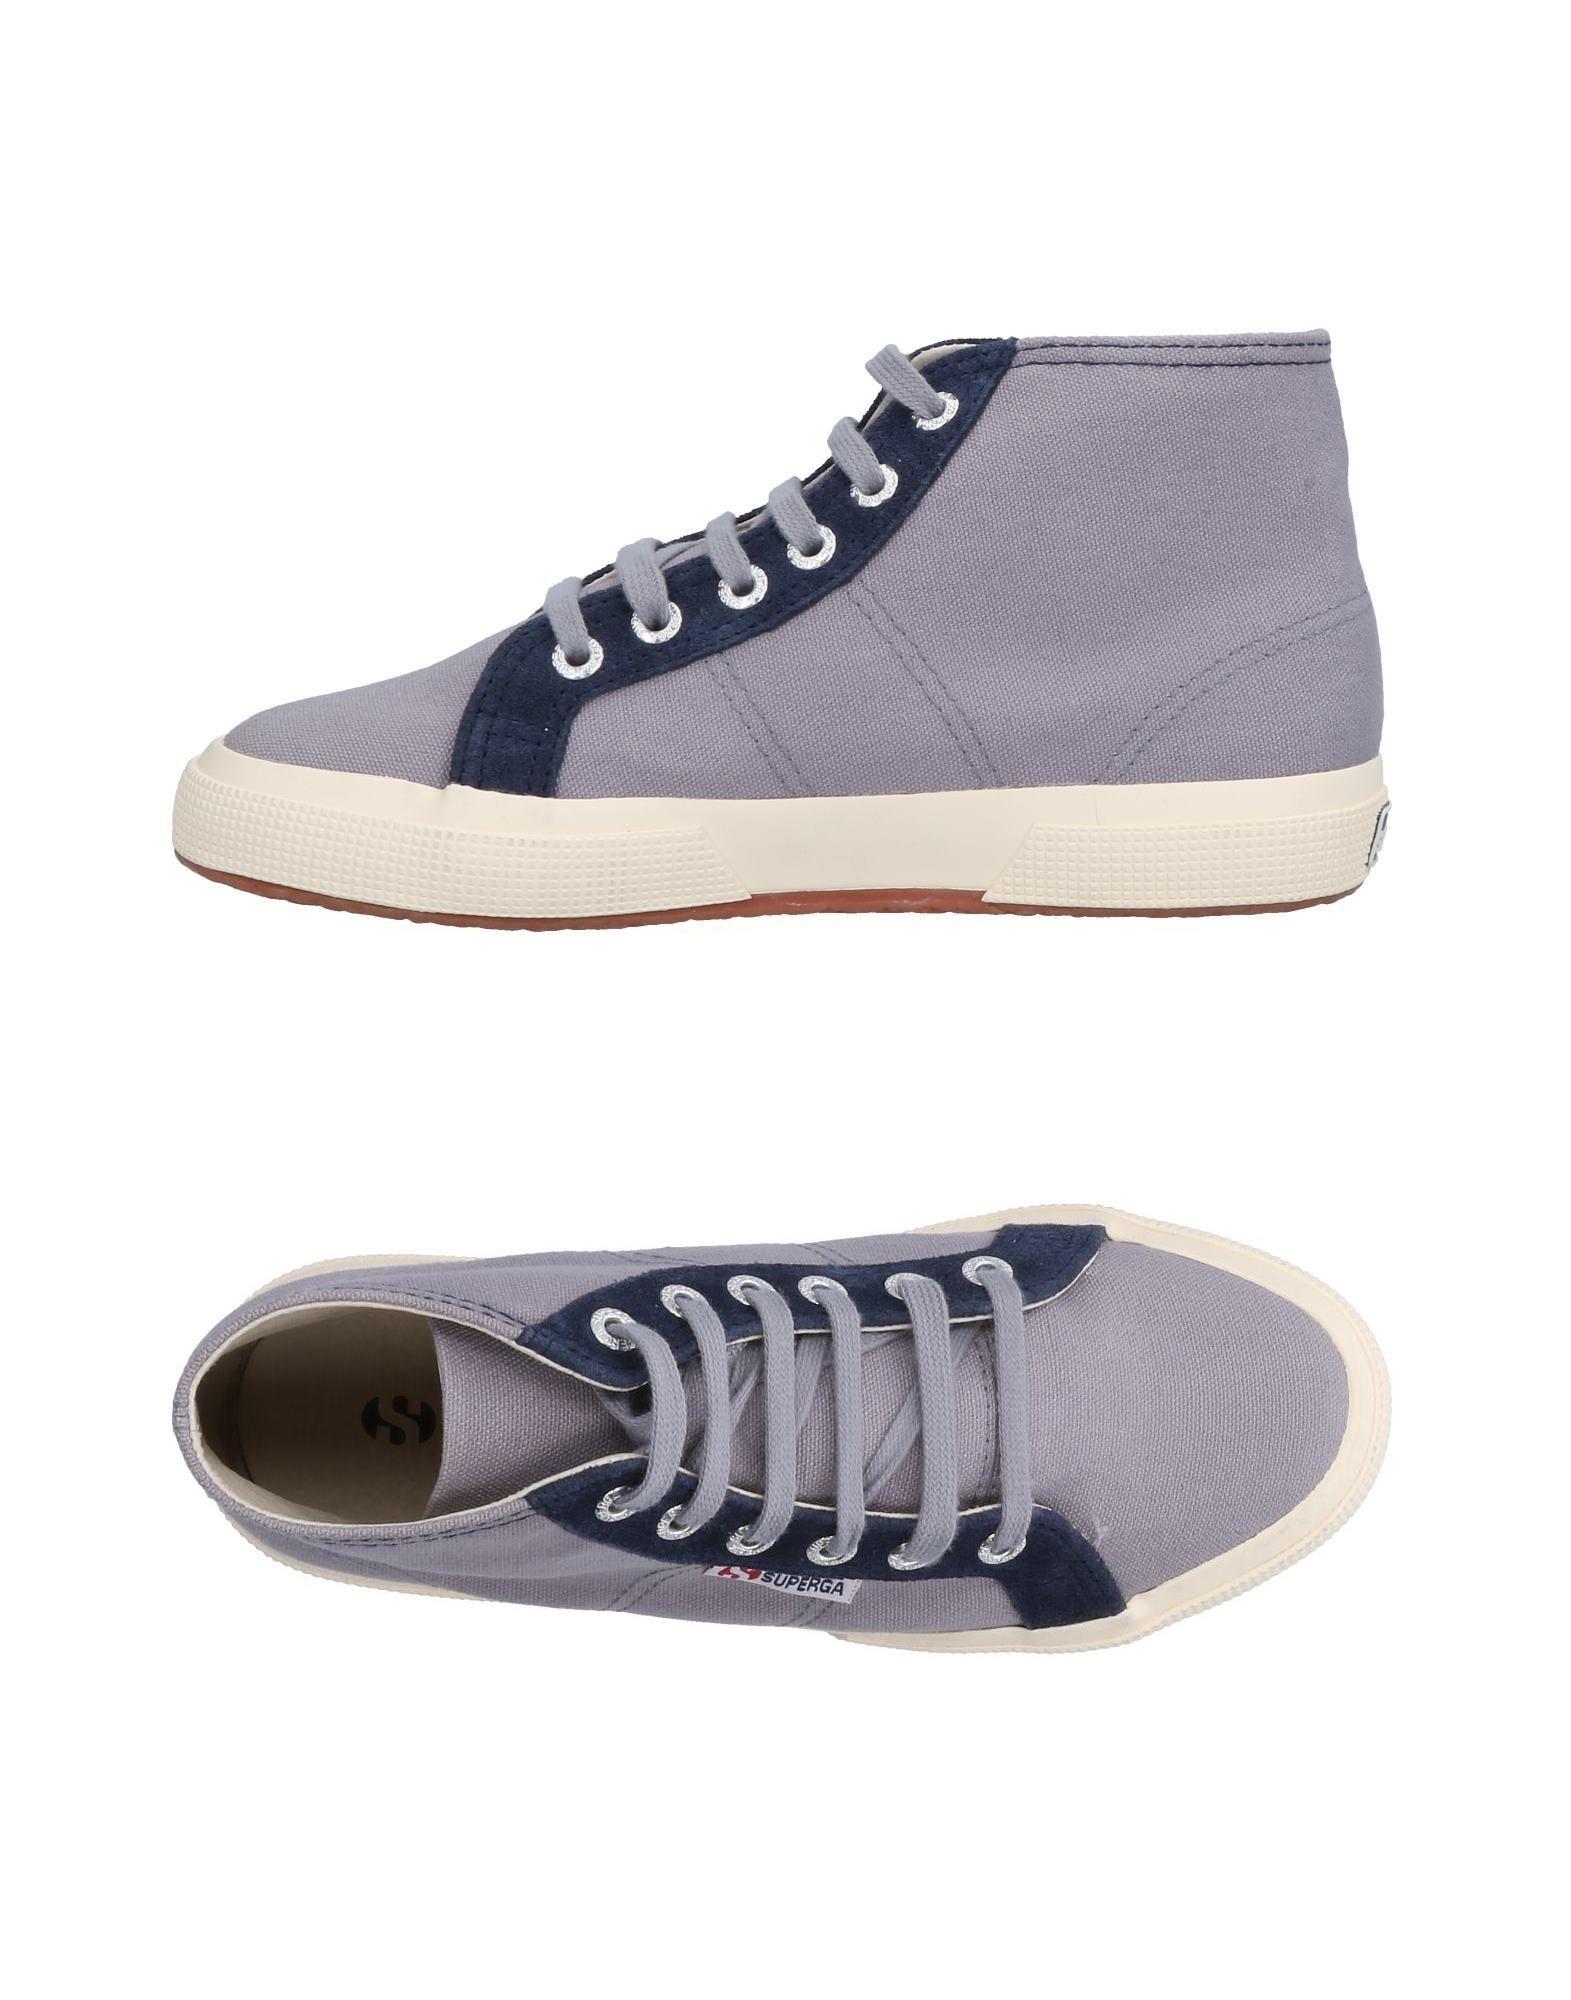 Superga® Gute Sneakers Damen  11200888VV Gute Superga® Qualität beliebte Schuhe 2af41a